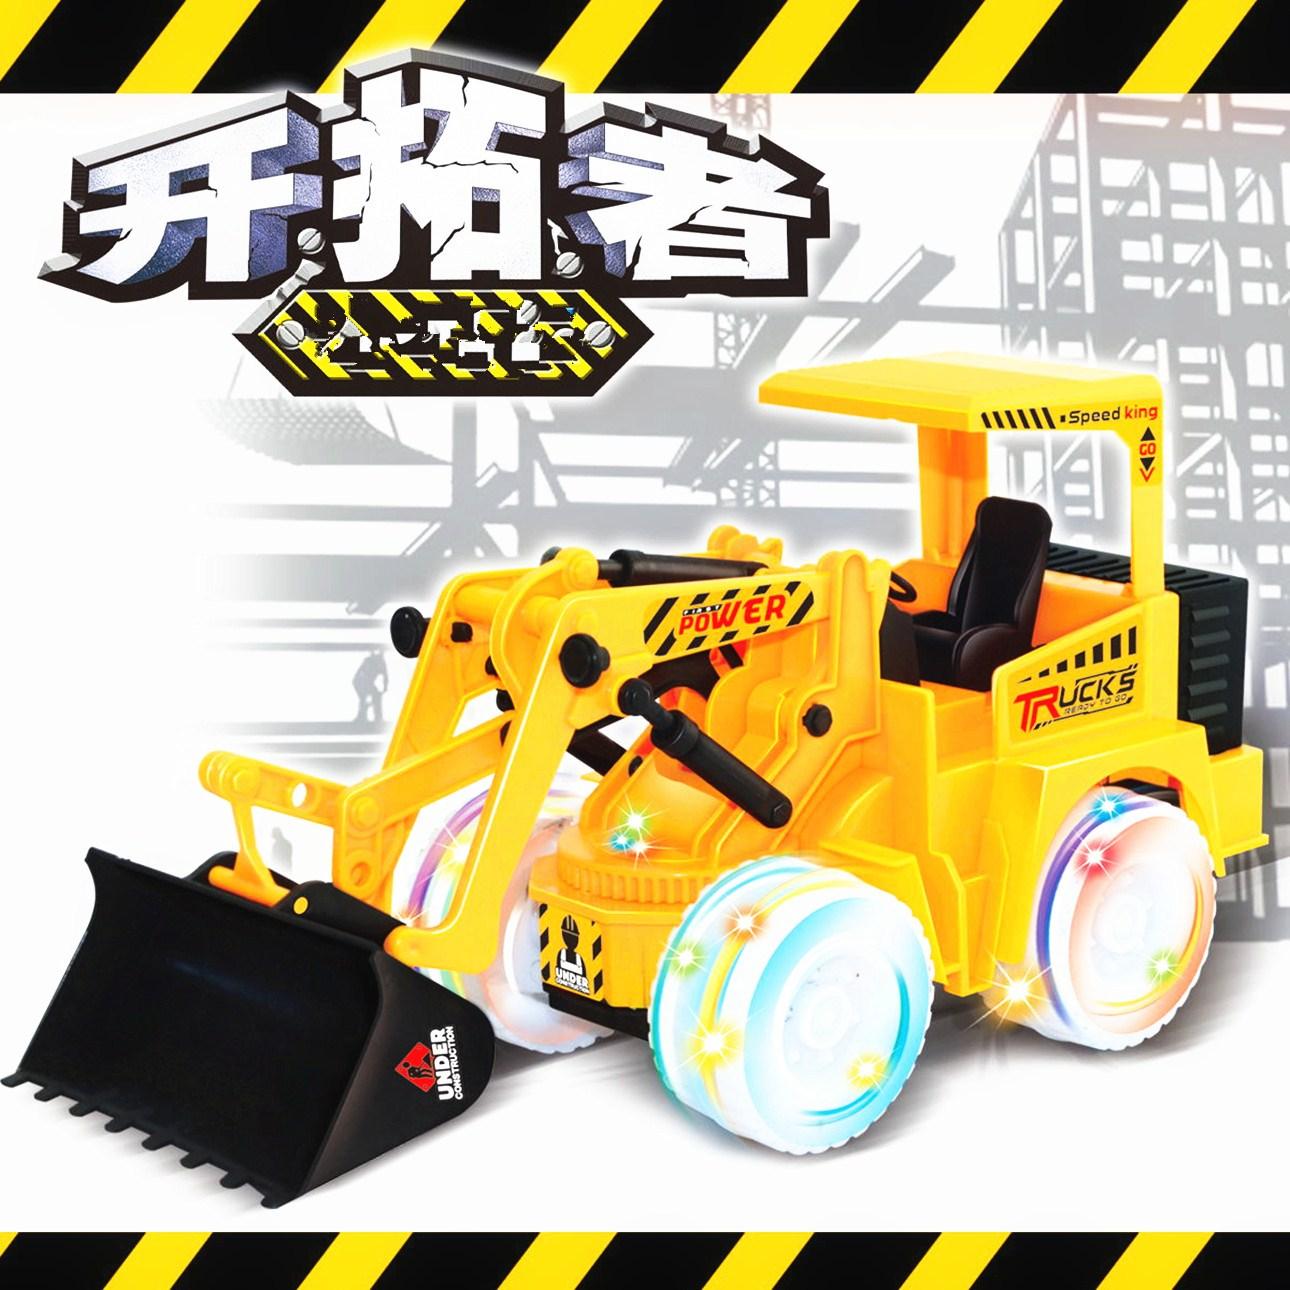 Gabelstapler - Bagger elektrische tuba Kinder spielzeug - auto ferngesteuerte Bagger die Bagger graben